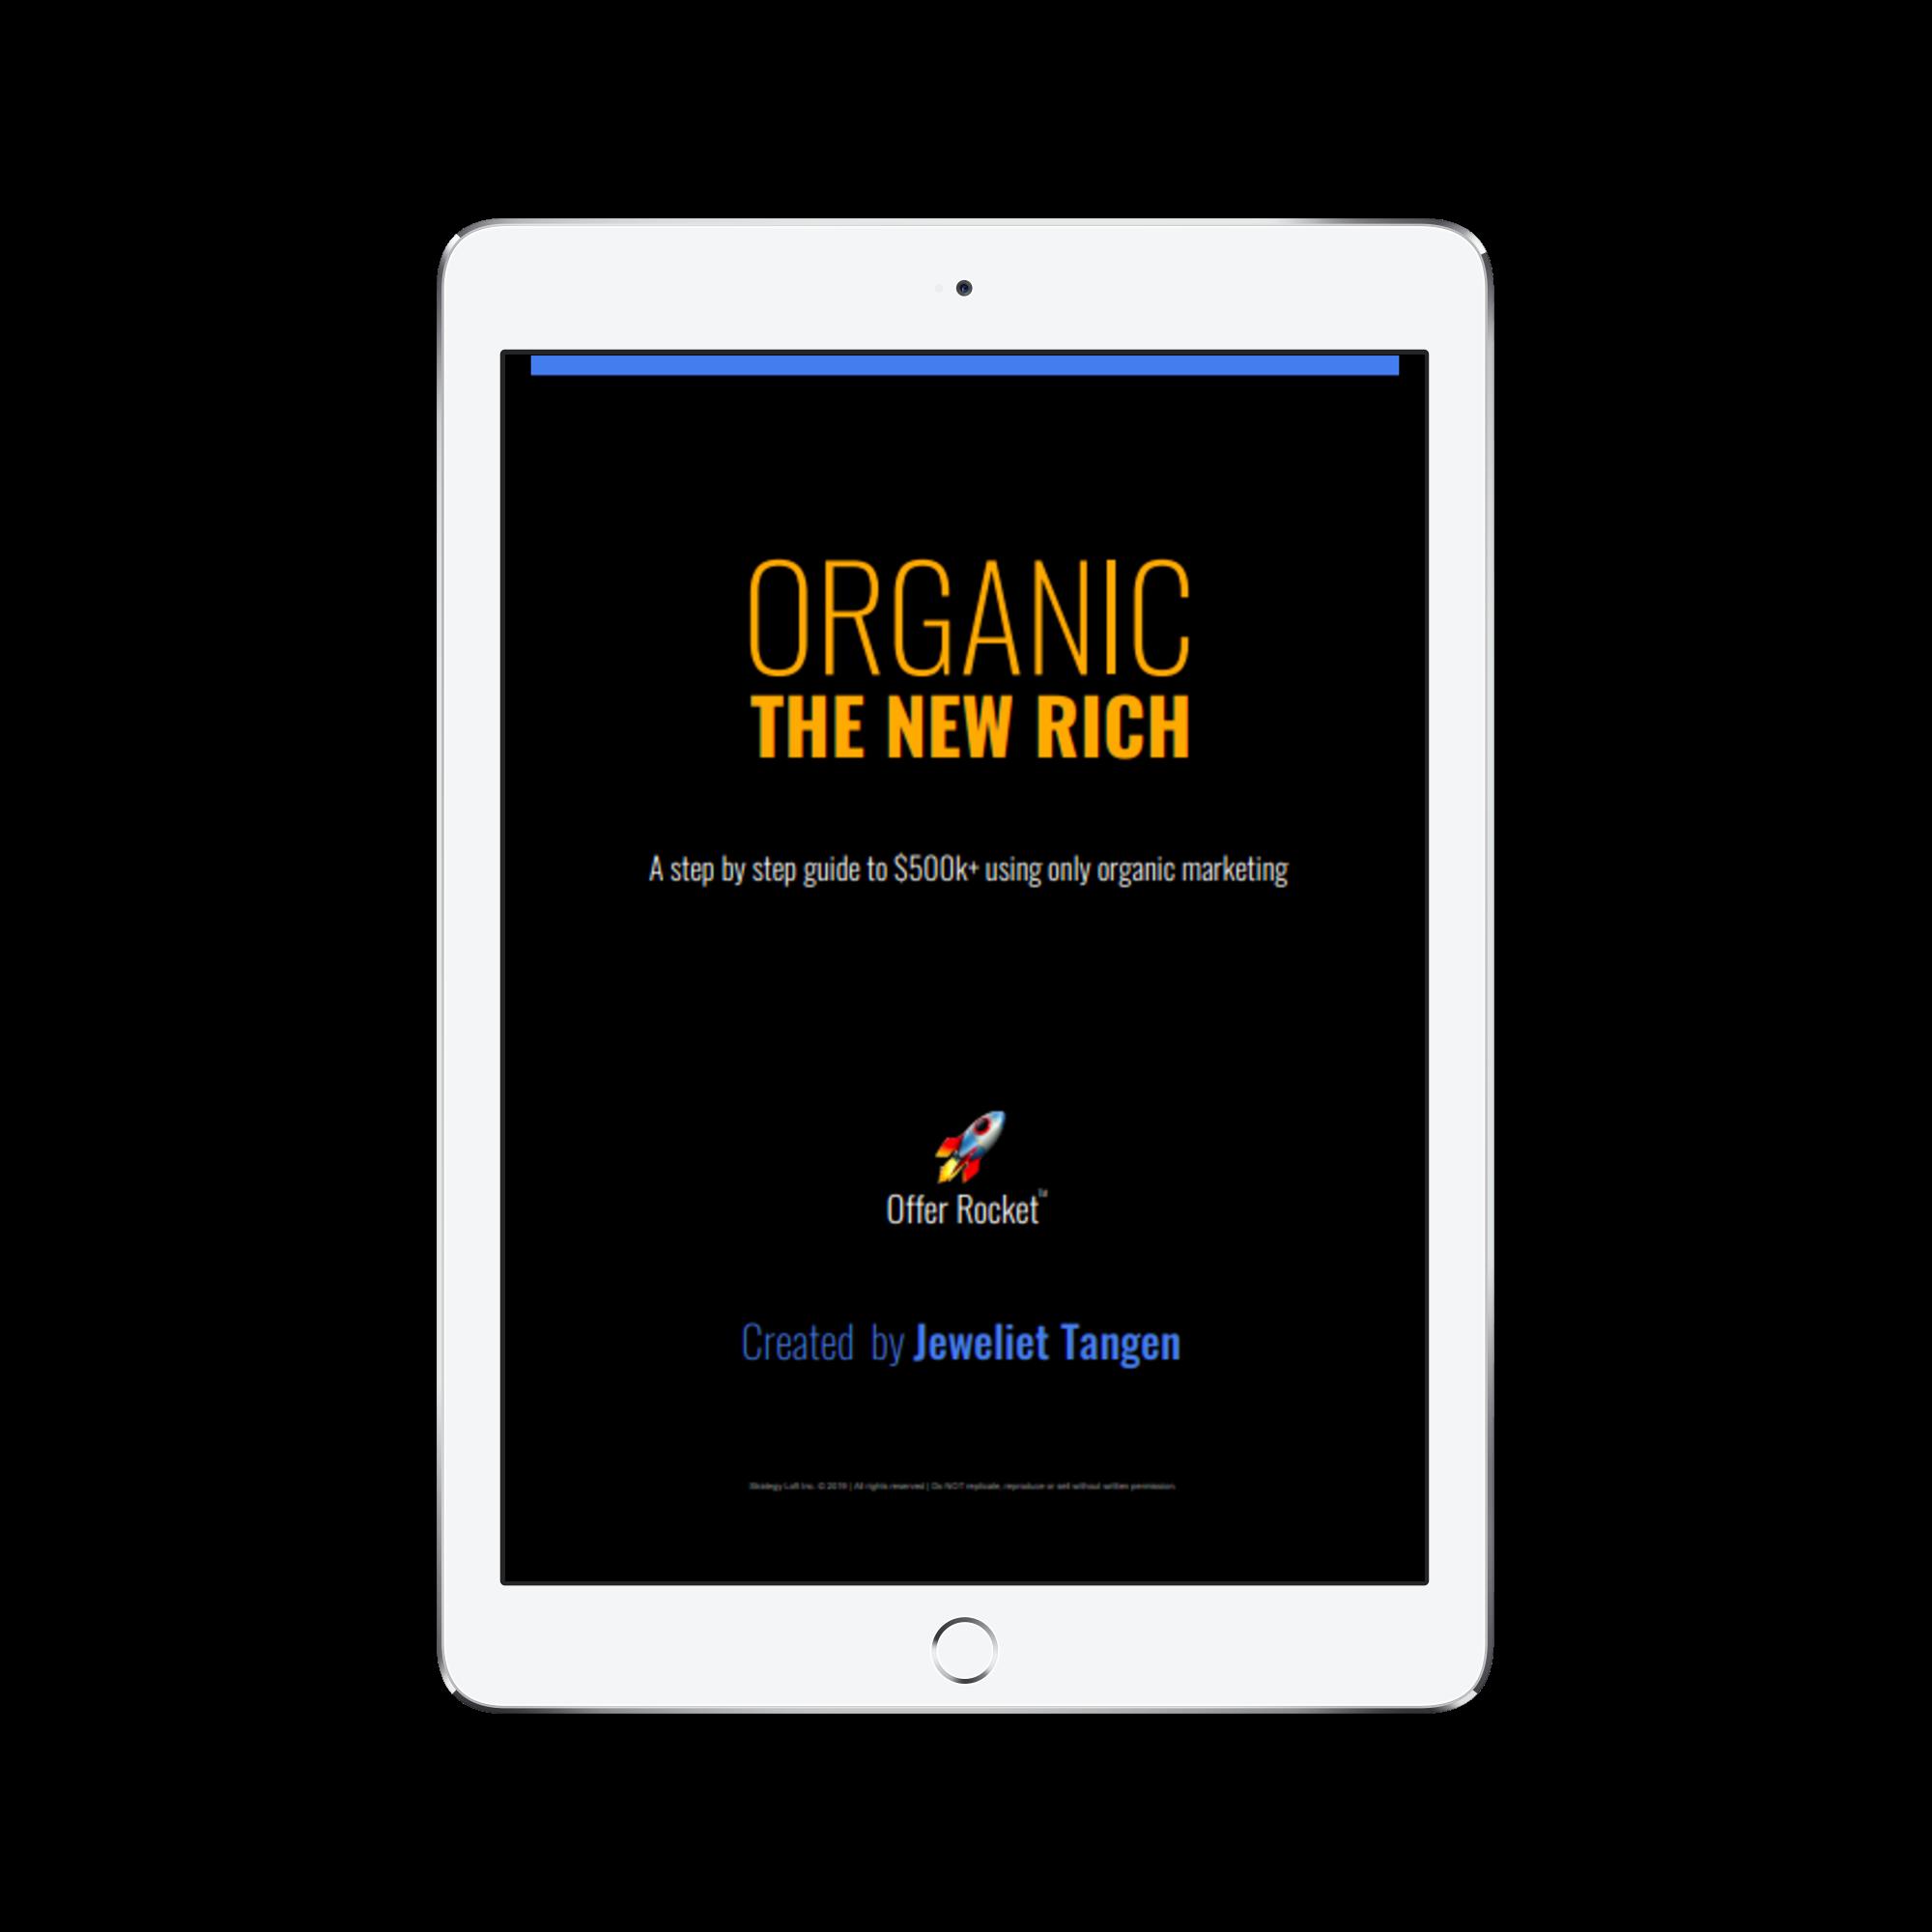 ORGANIC MARKETING 2.0 Download